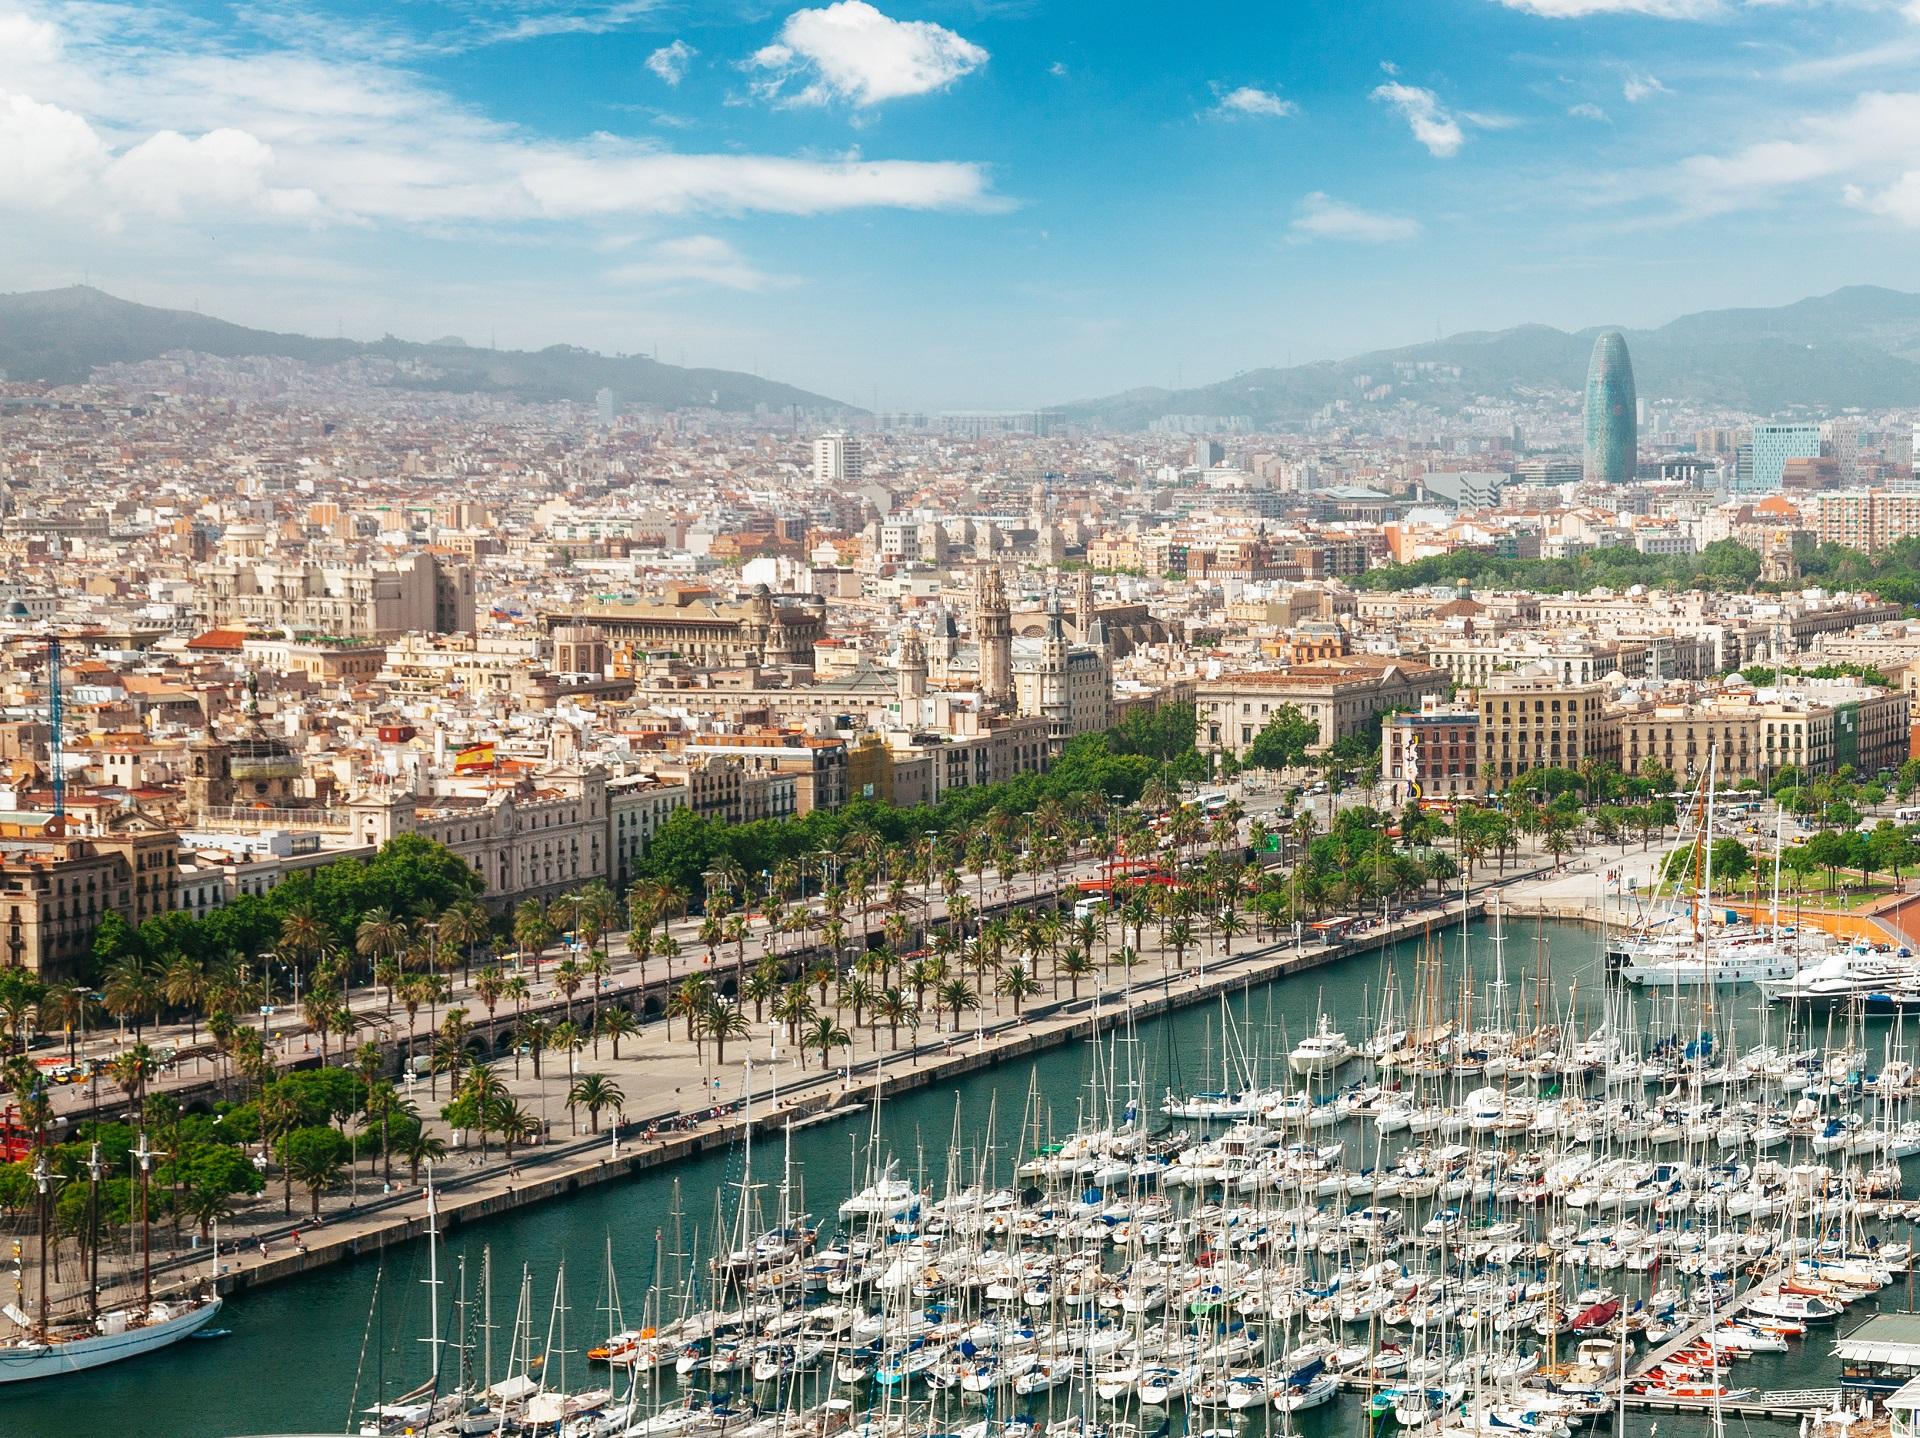 Die Hafenstadt Barcelona